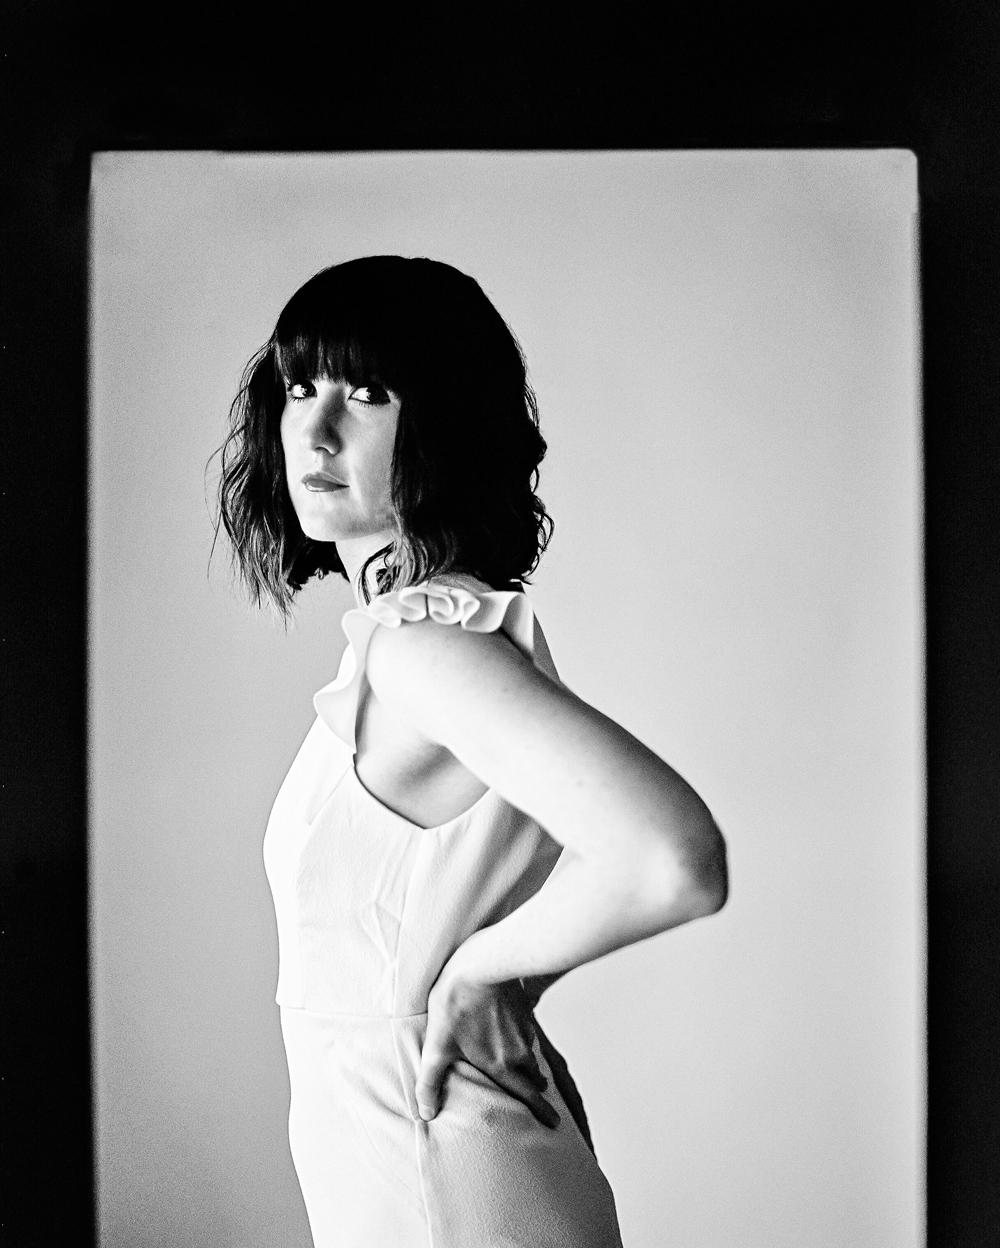 Ellen-Portraits-BW--9.jpg